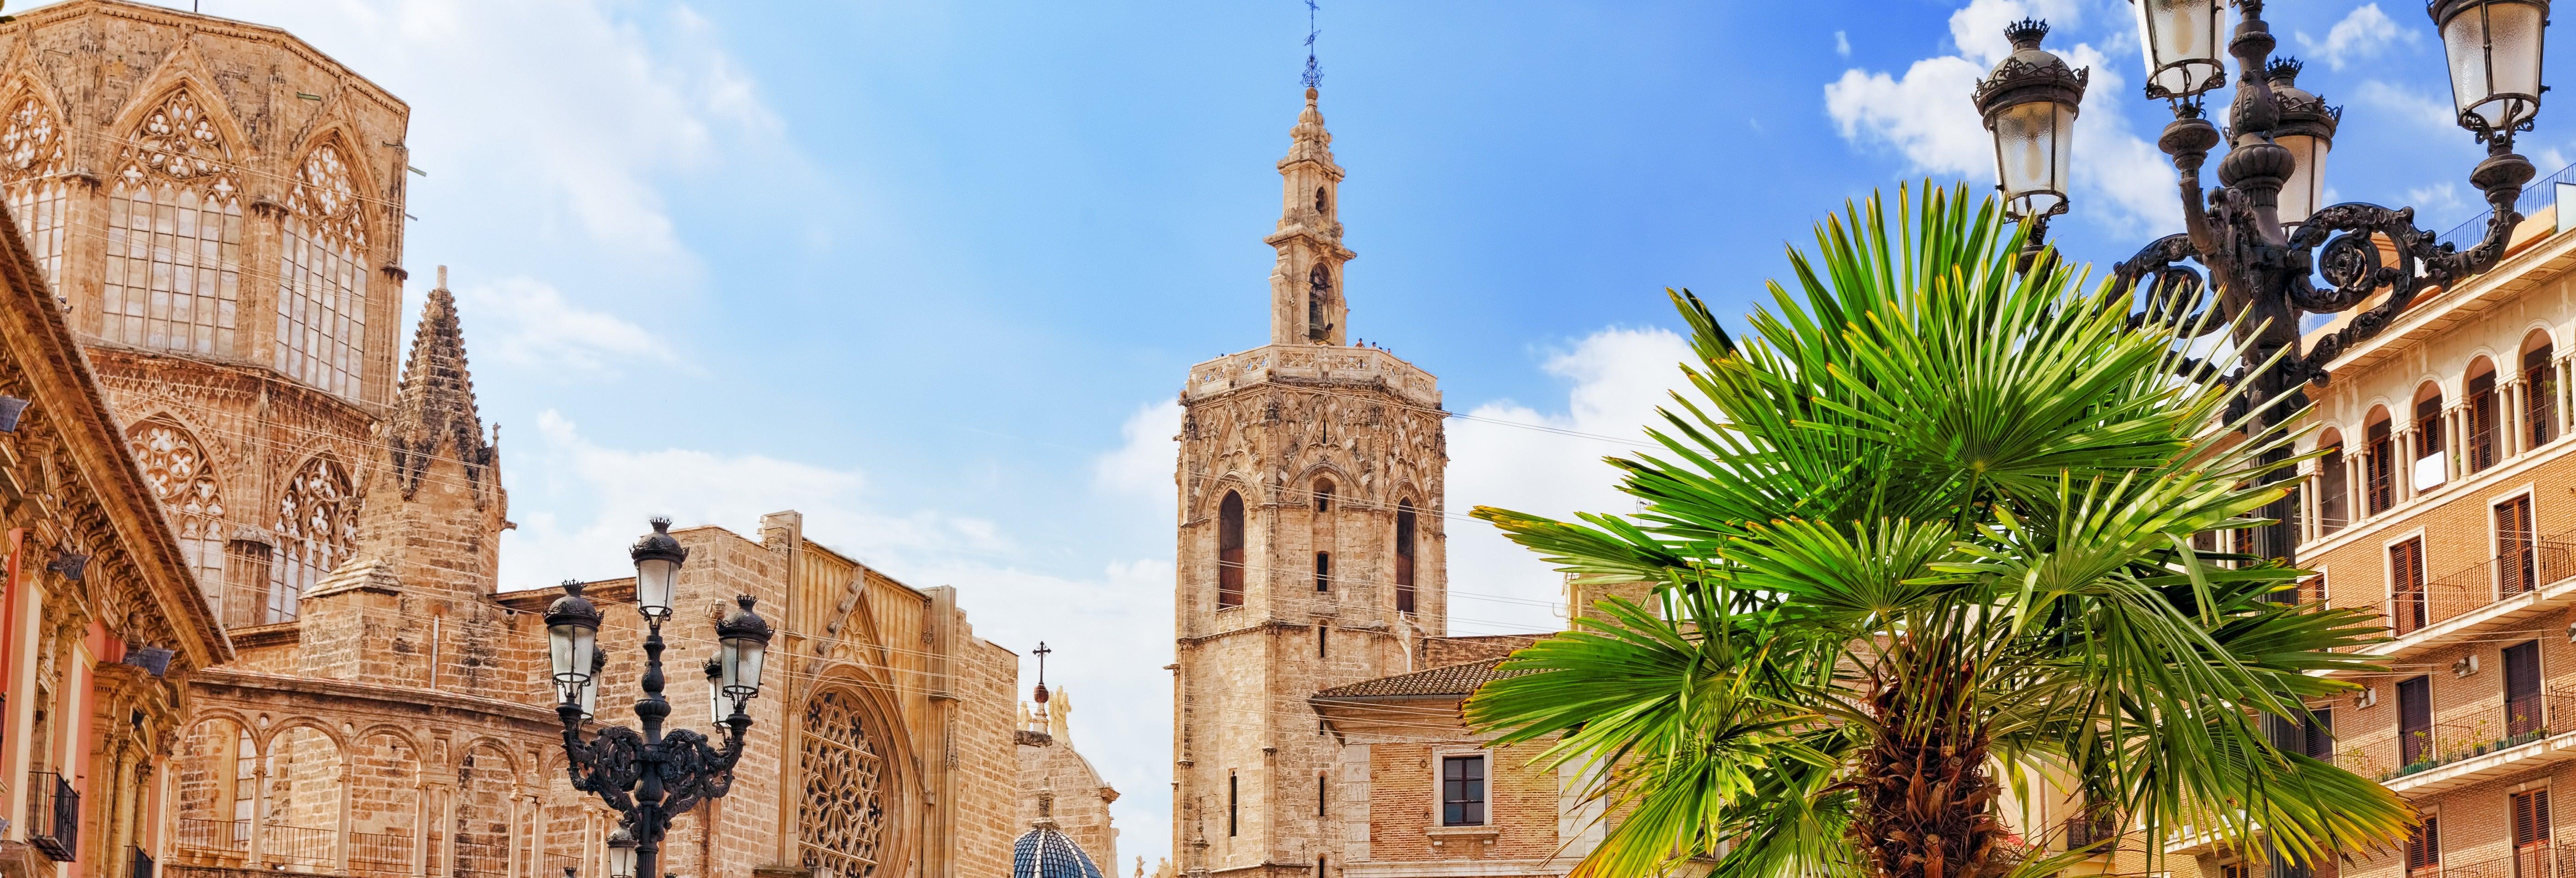 Visite privée dans Valence